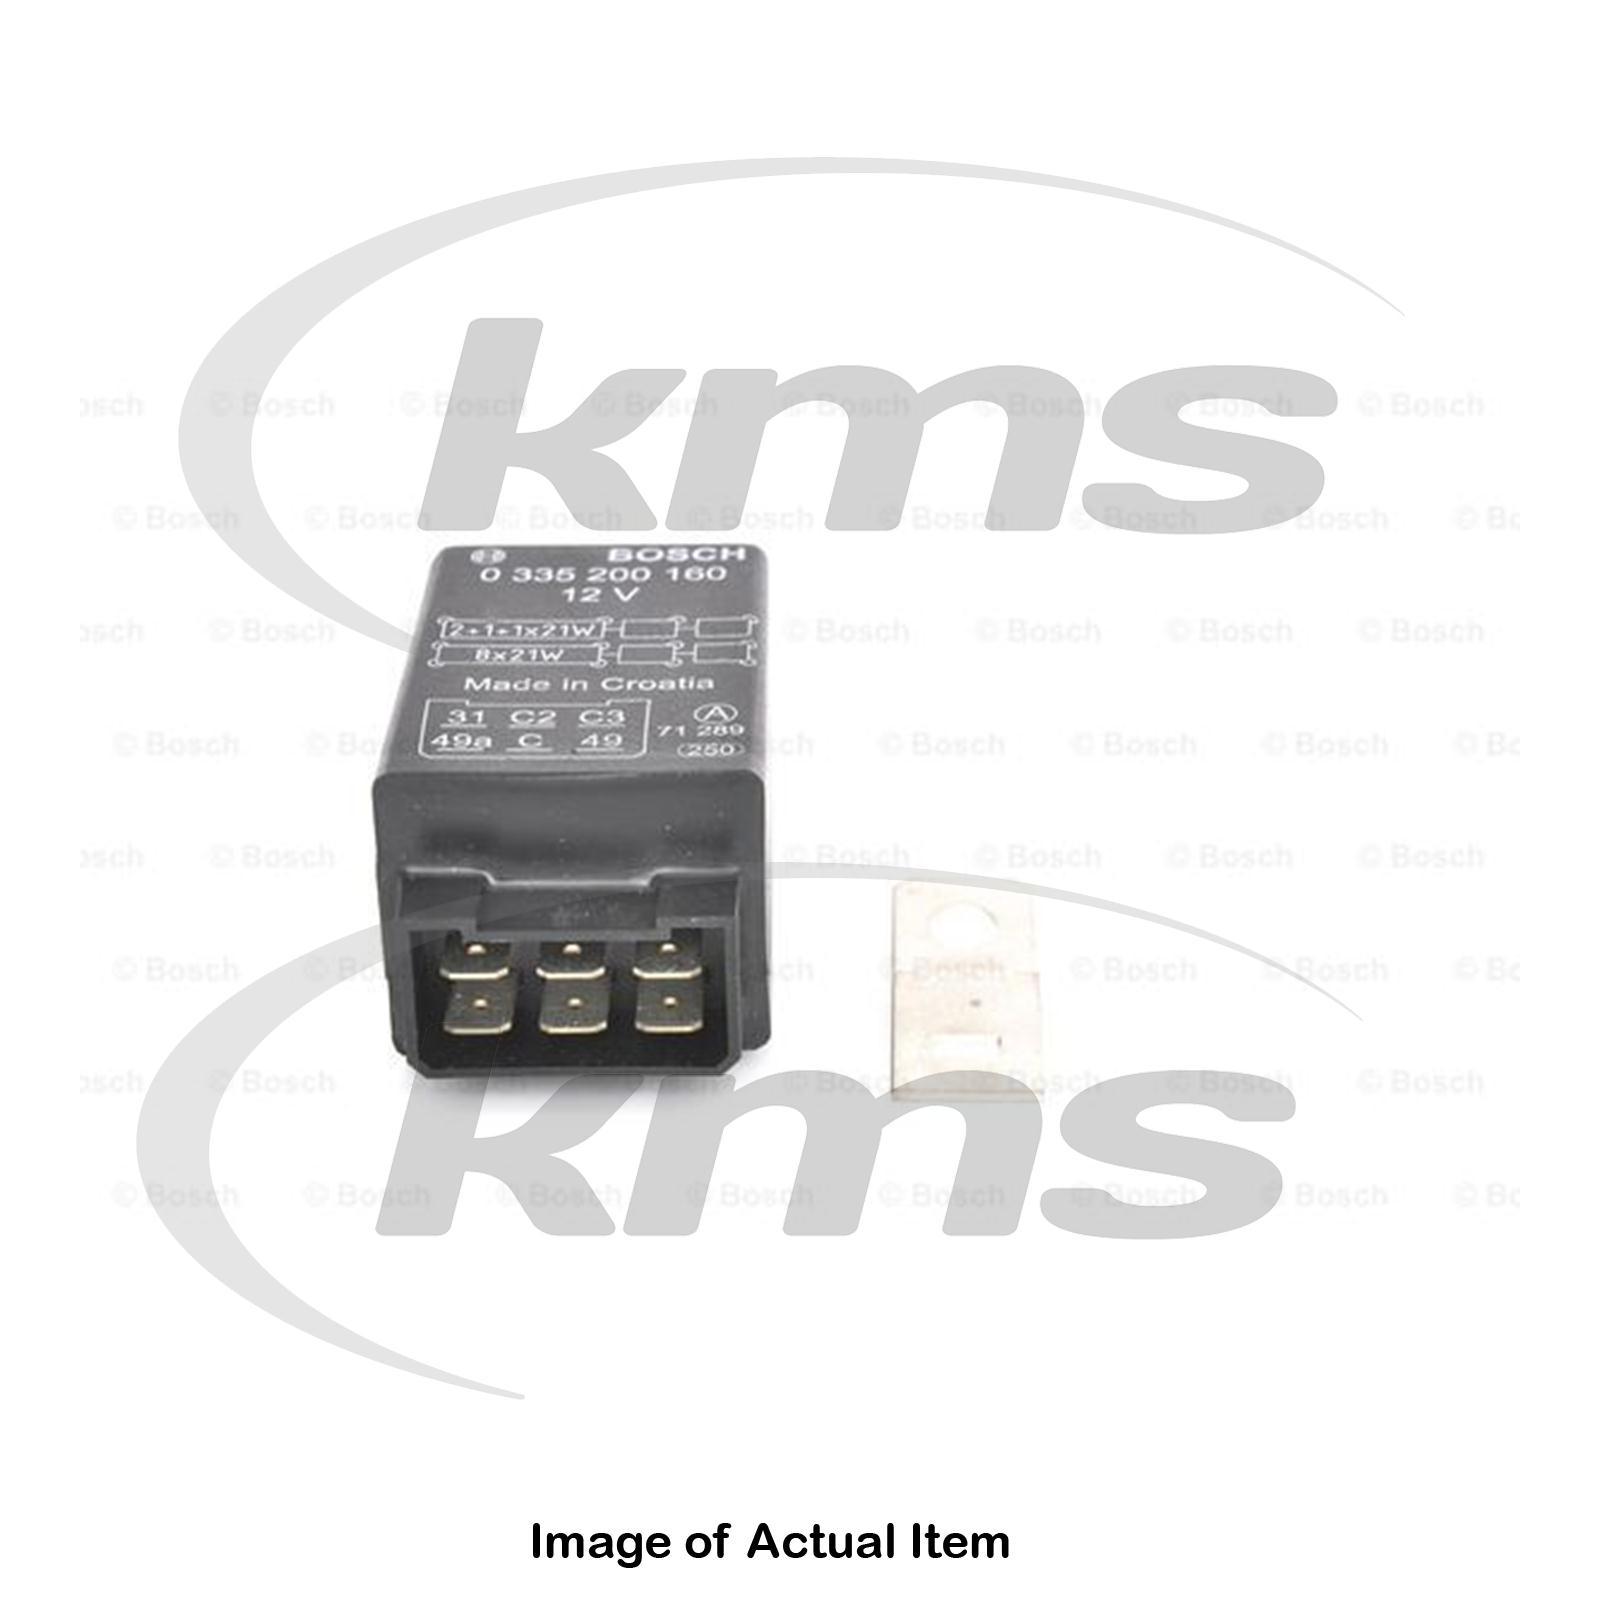 New Genuine Bosch Flasher Relay Unit 0 335 200 160 Top